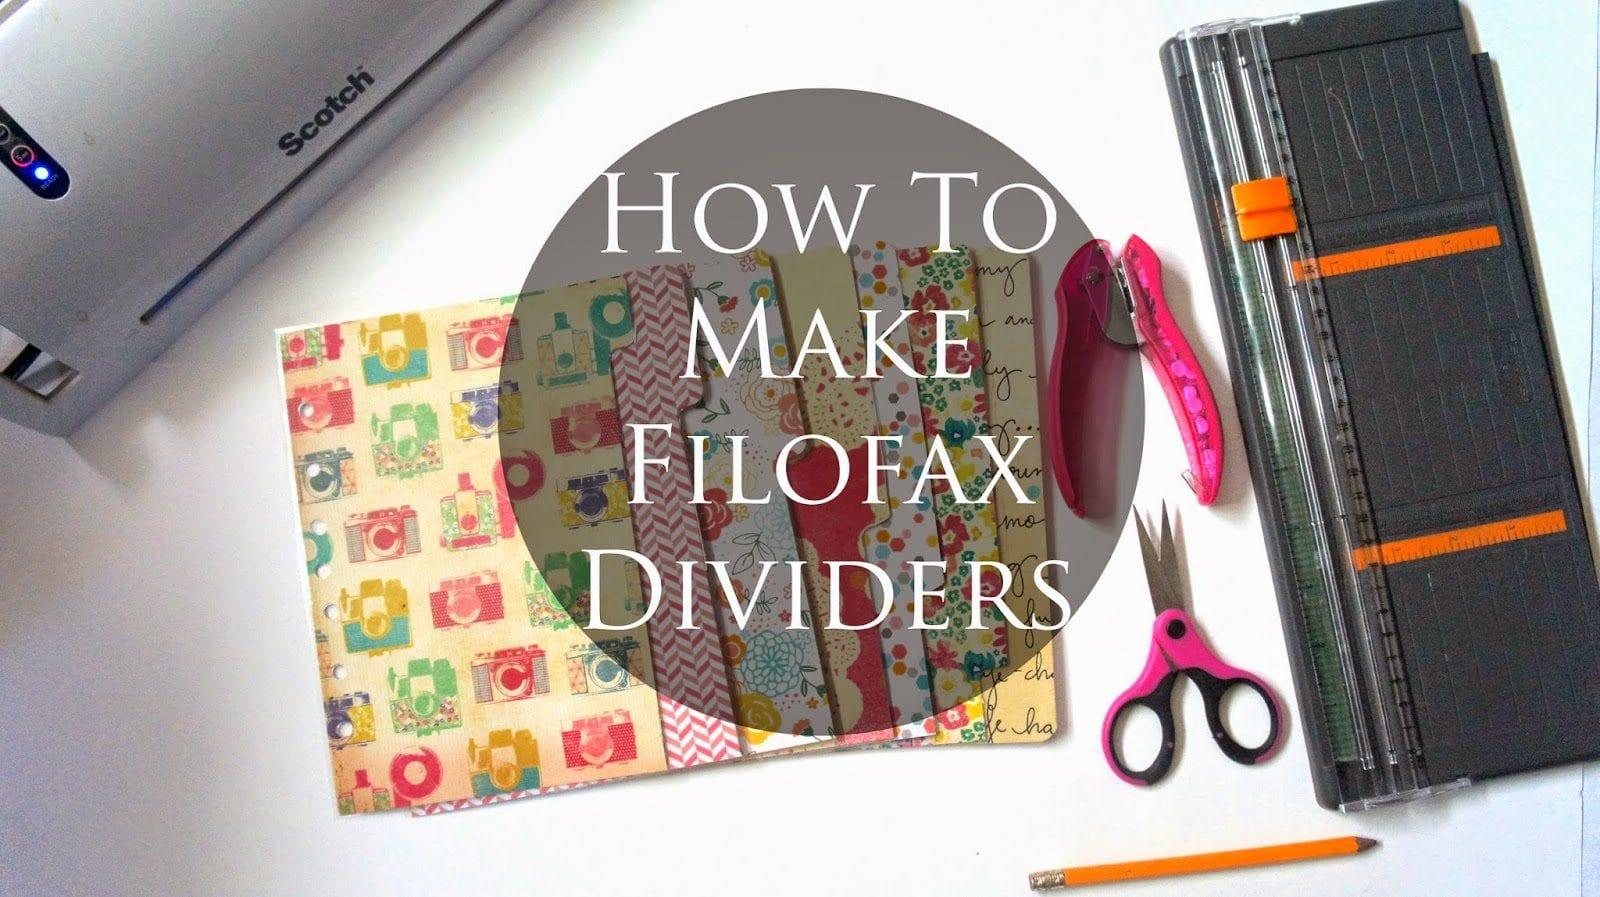 How To Make Filofax Dividers